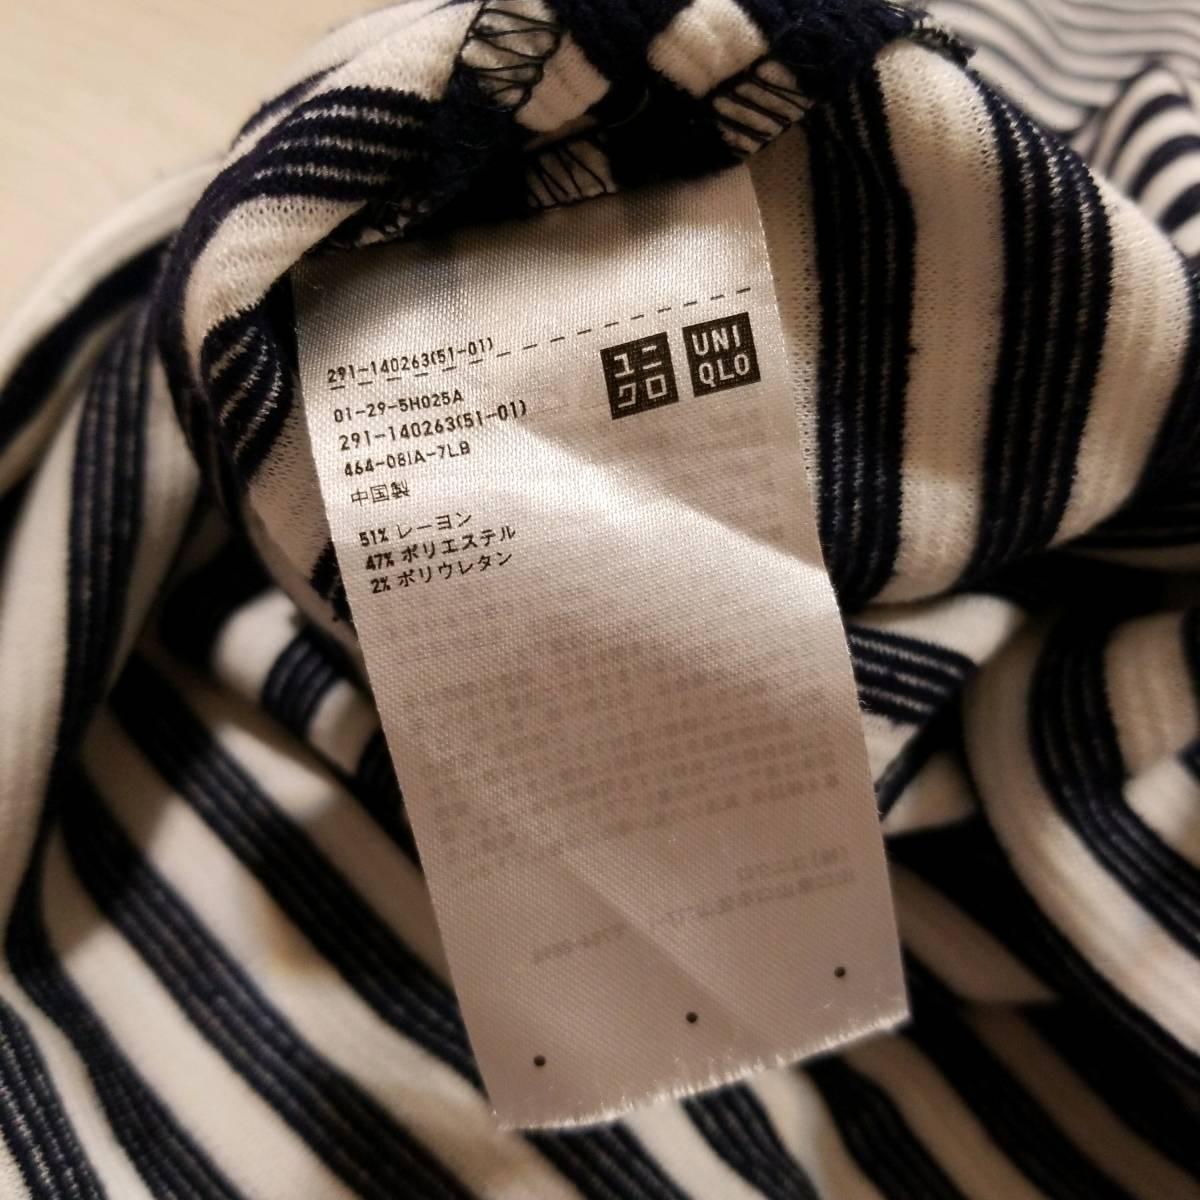 K136 UNIQLO ユニクロ M レディース Tシャツ ワンピース カットソー ボーダー柄 ネイビー系 紺系